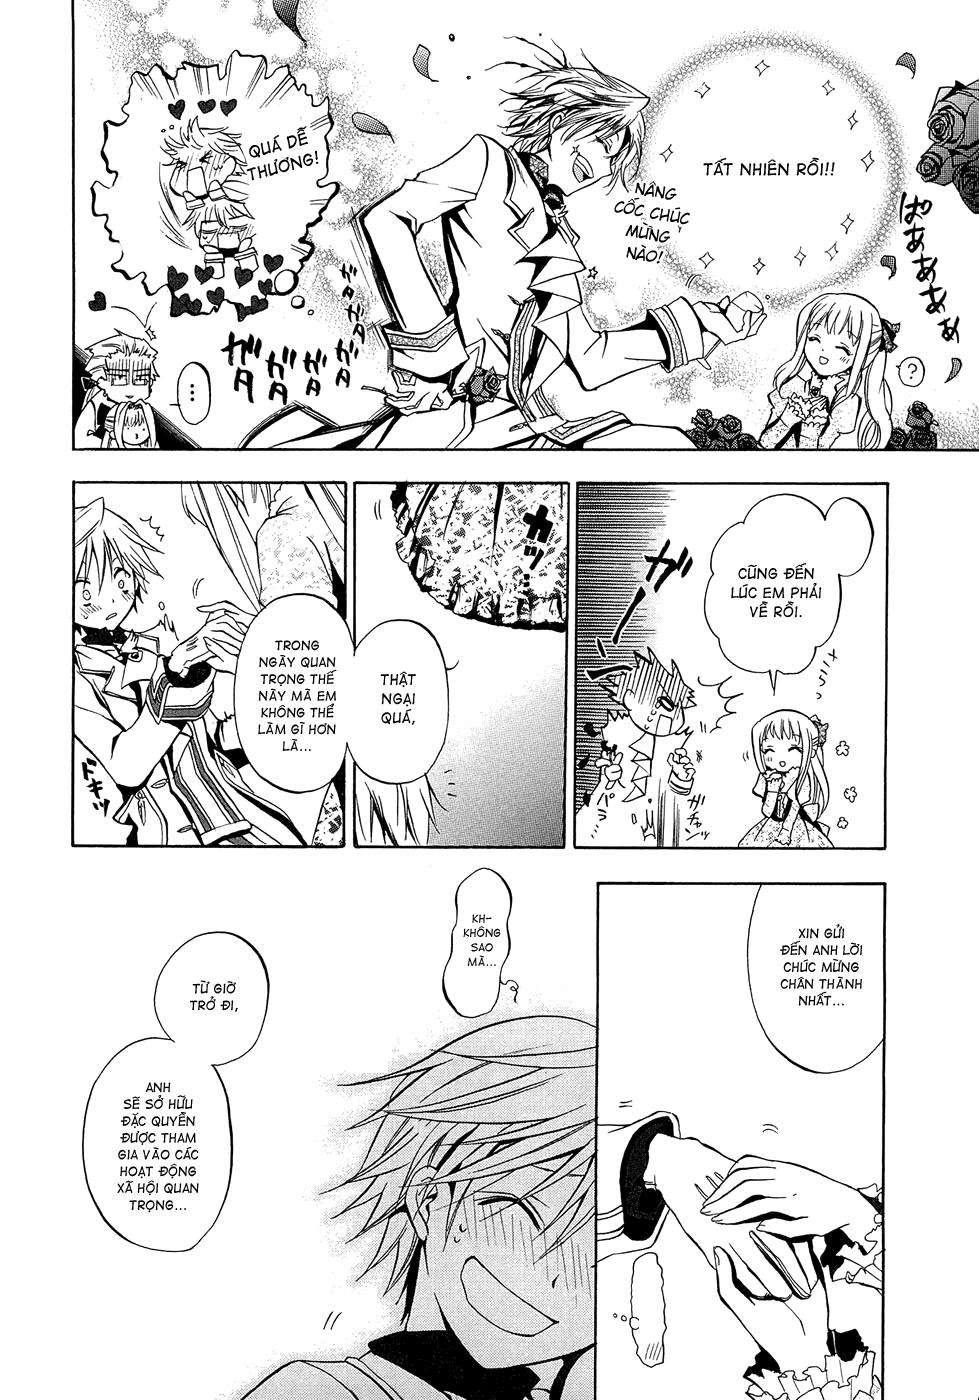 Pandora Hearts chương 002 - retrace: ii tempest of conviction trang 6